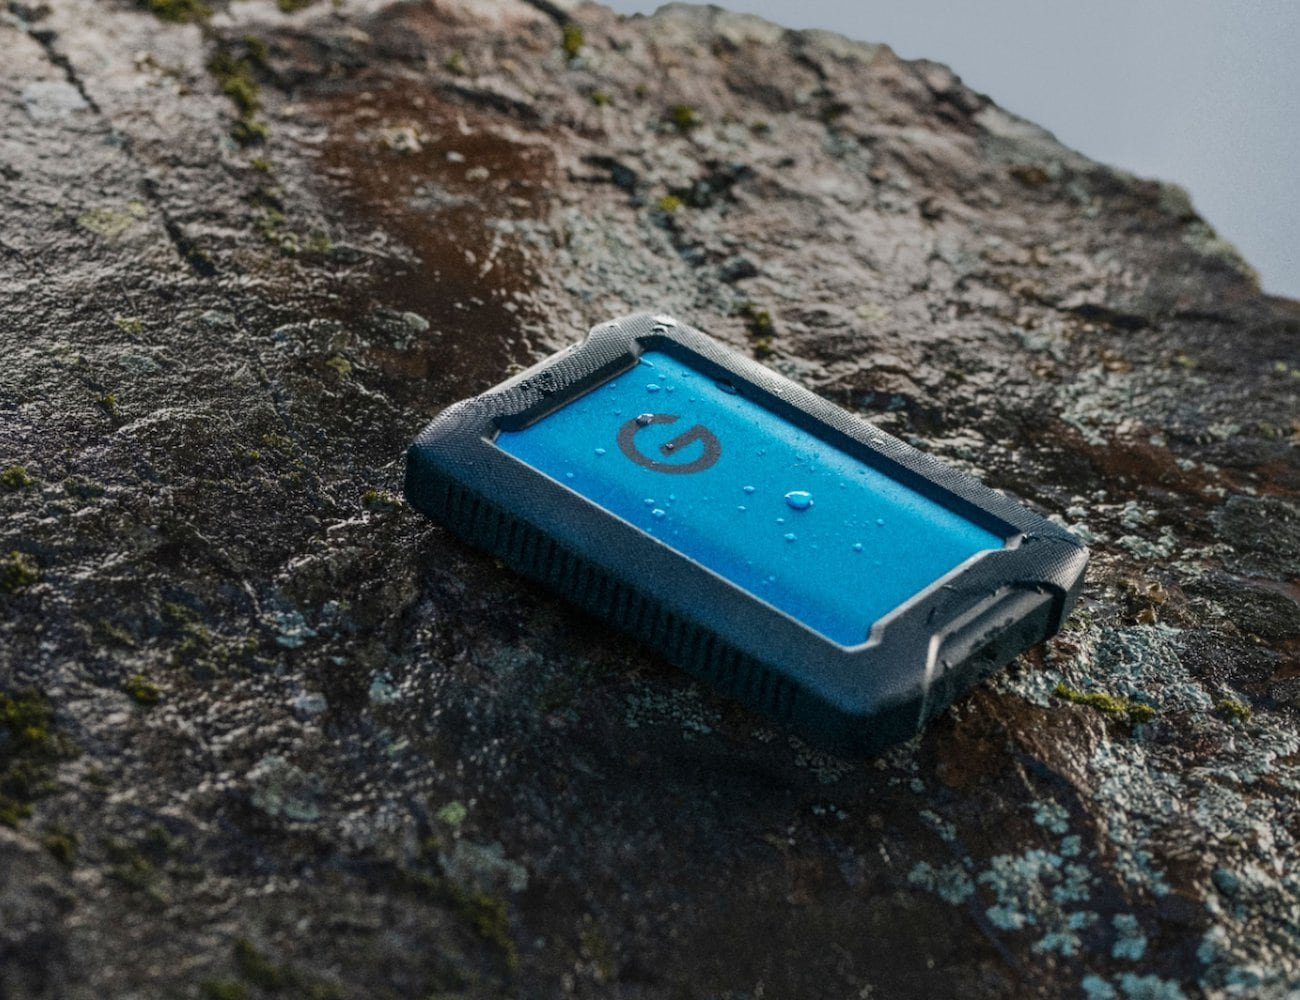 Western Digital G-Technology ArmorATD Rugged Portable Hard Drive handles your adventurous lifestyle